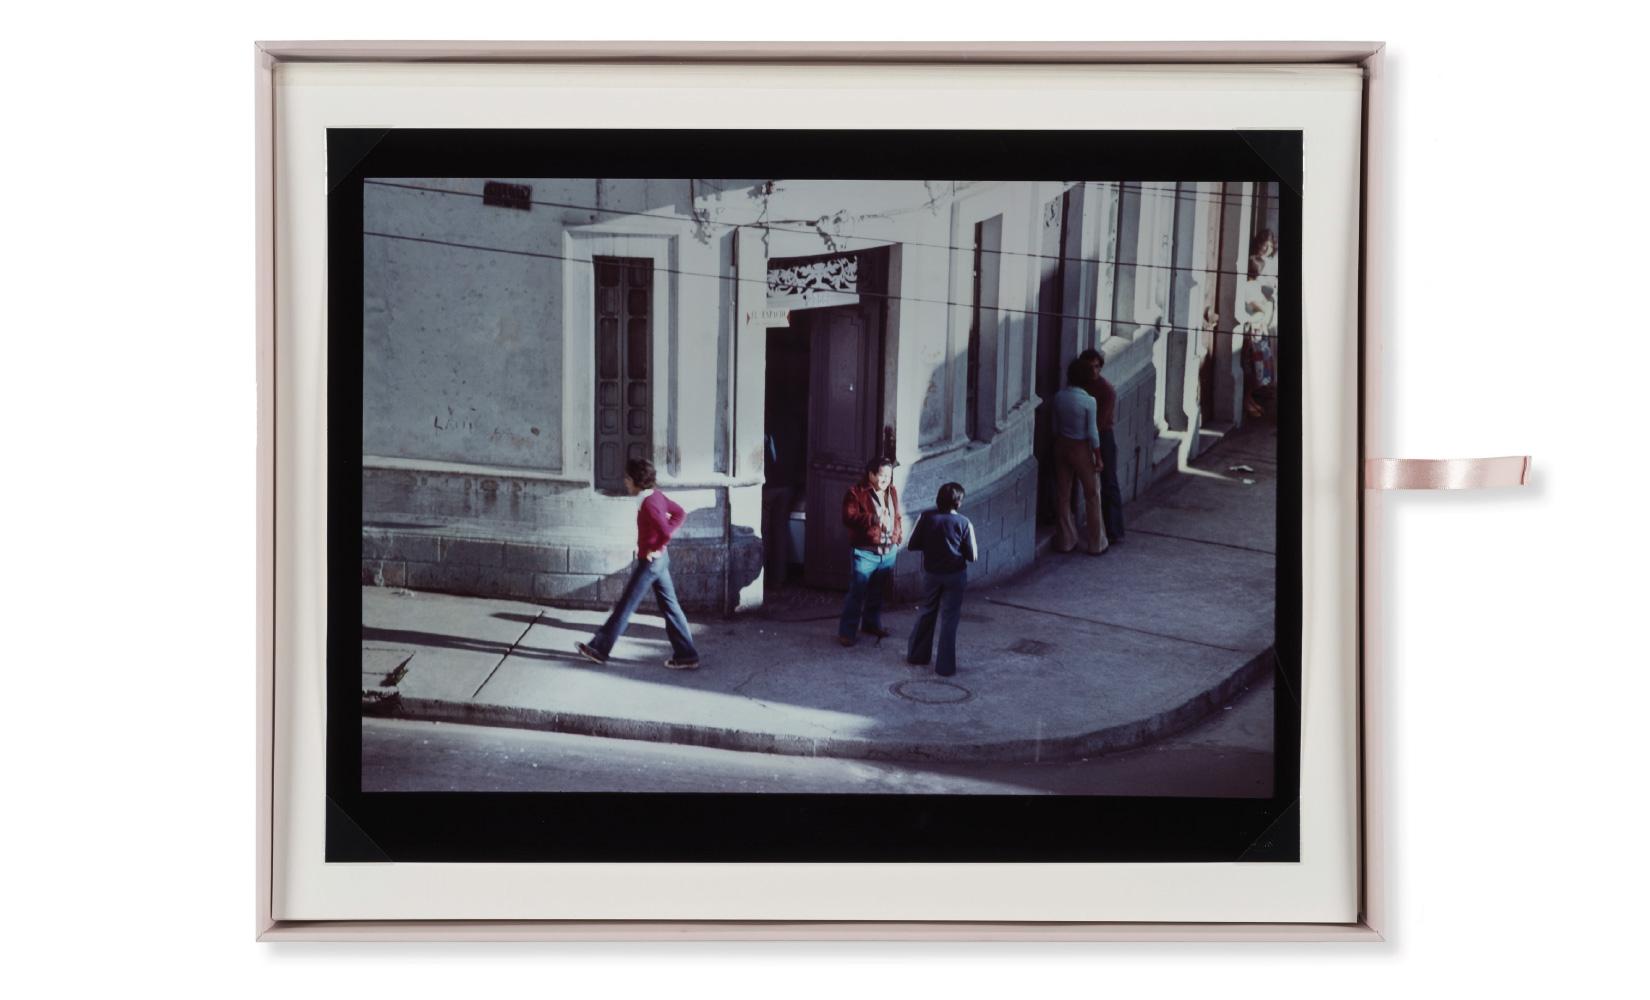 esquina-rose-rojas-toluca-studio-olivier-andreotti-08.jpg